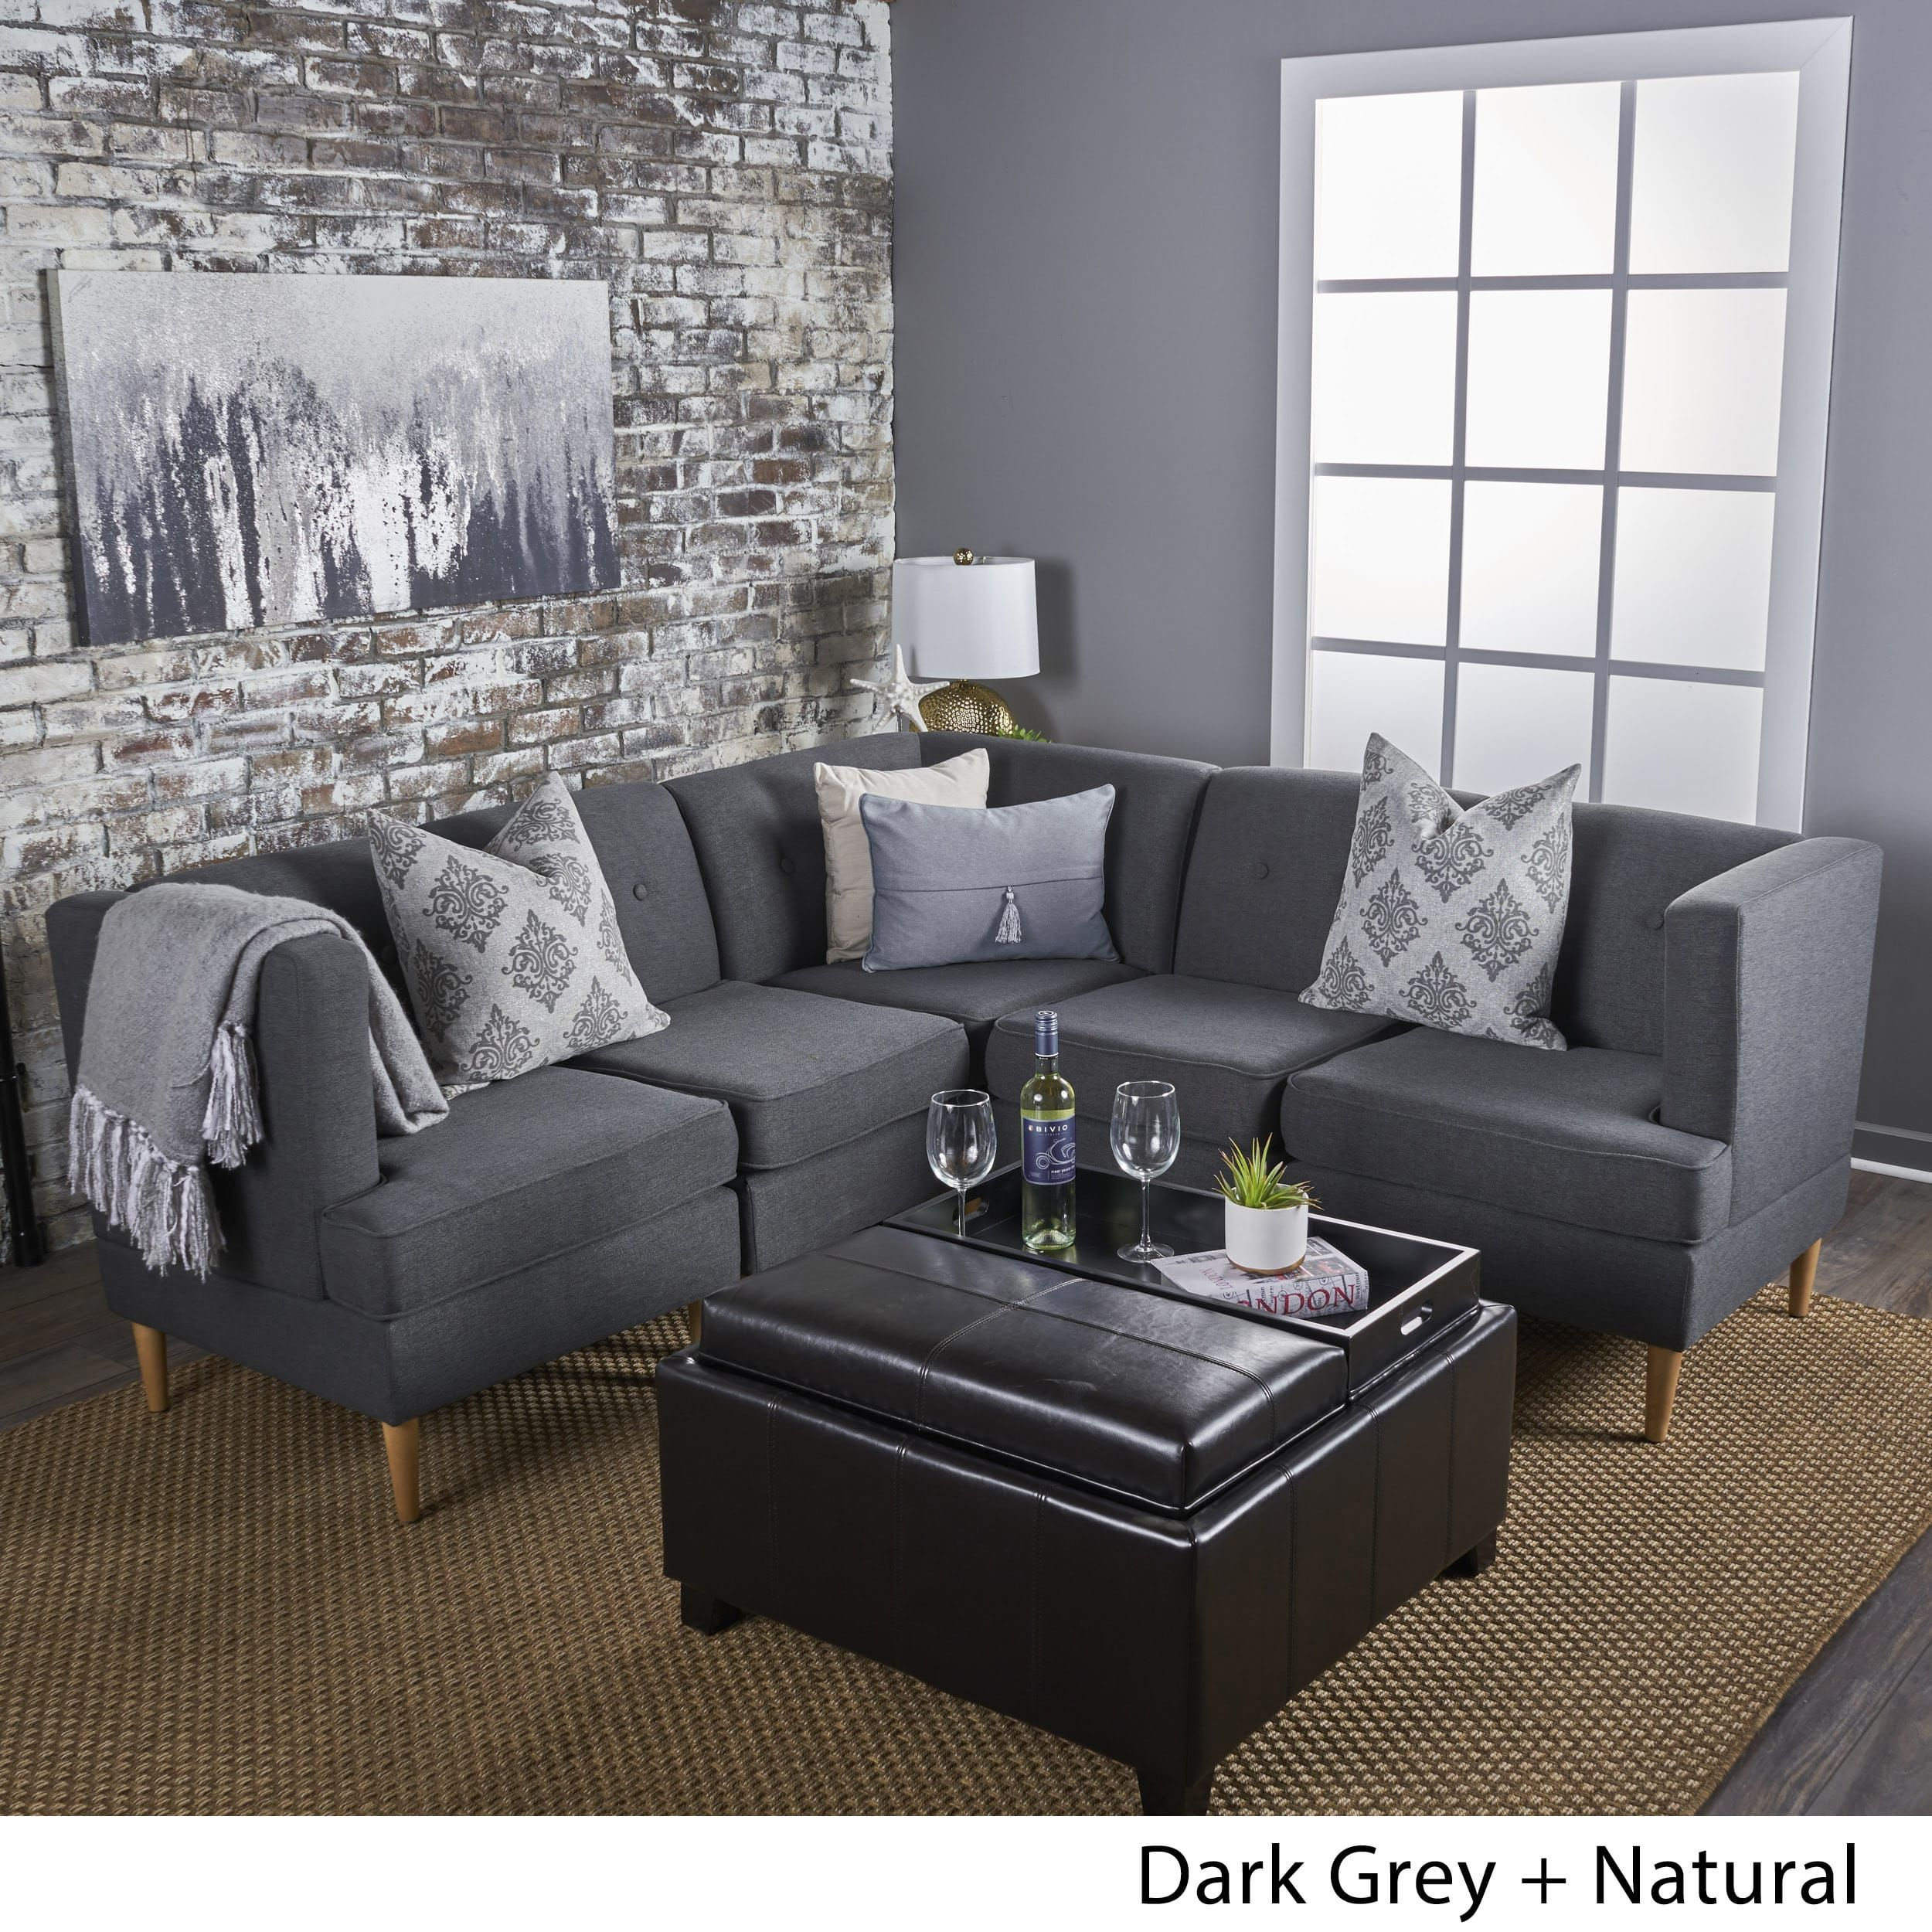 Astounding Milton Mid Century Modern 5 Piece Fabric Sectional Sofa Set Unemploymentrelief Wooden Chair Designs For Living Room Unemploymentrelieforg